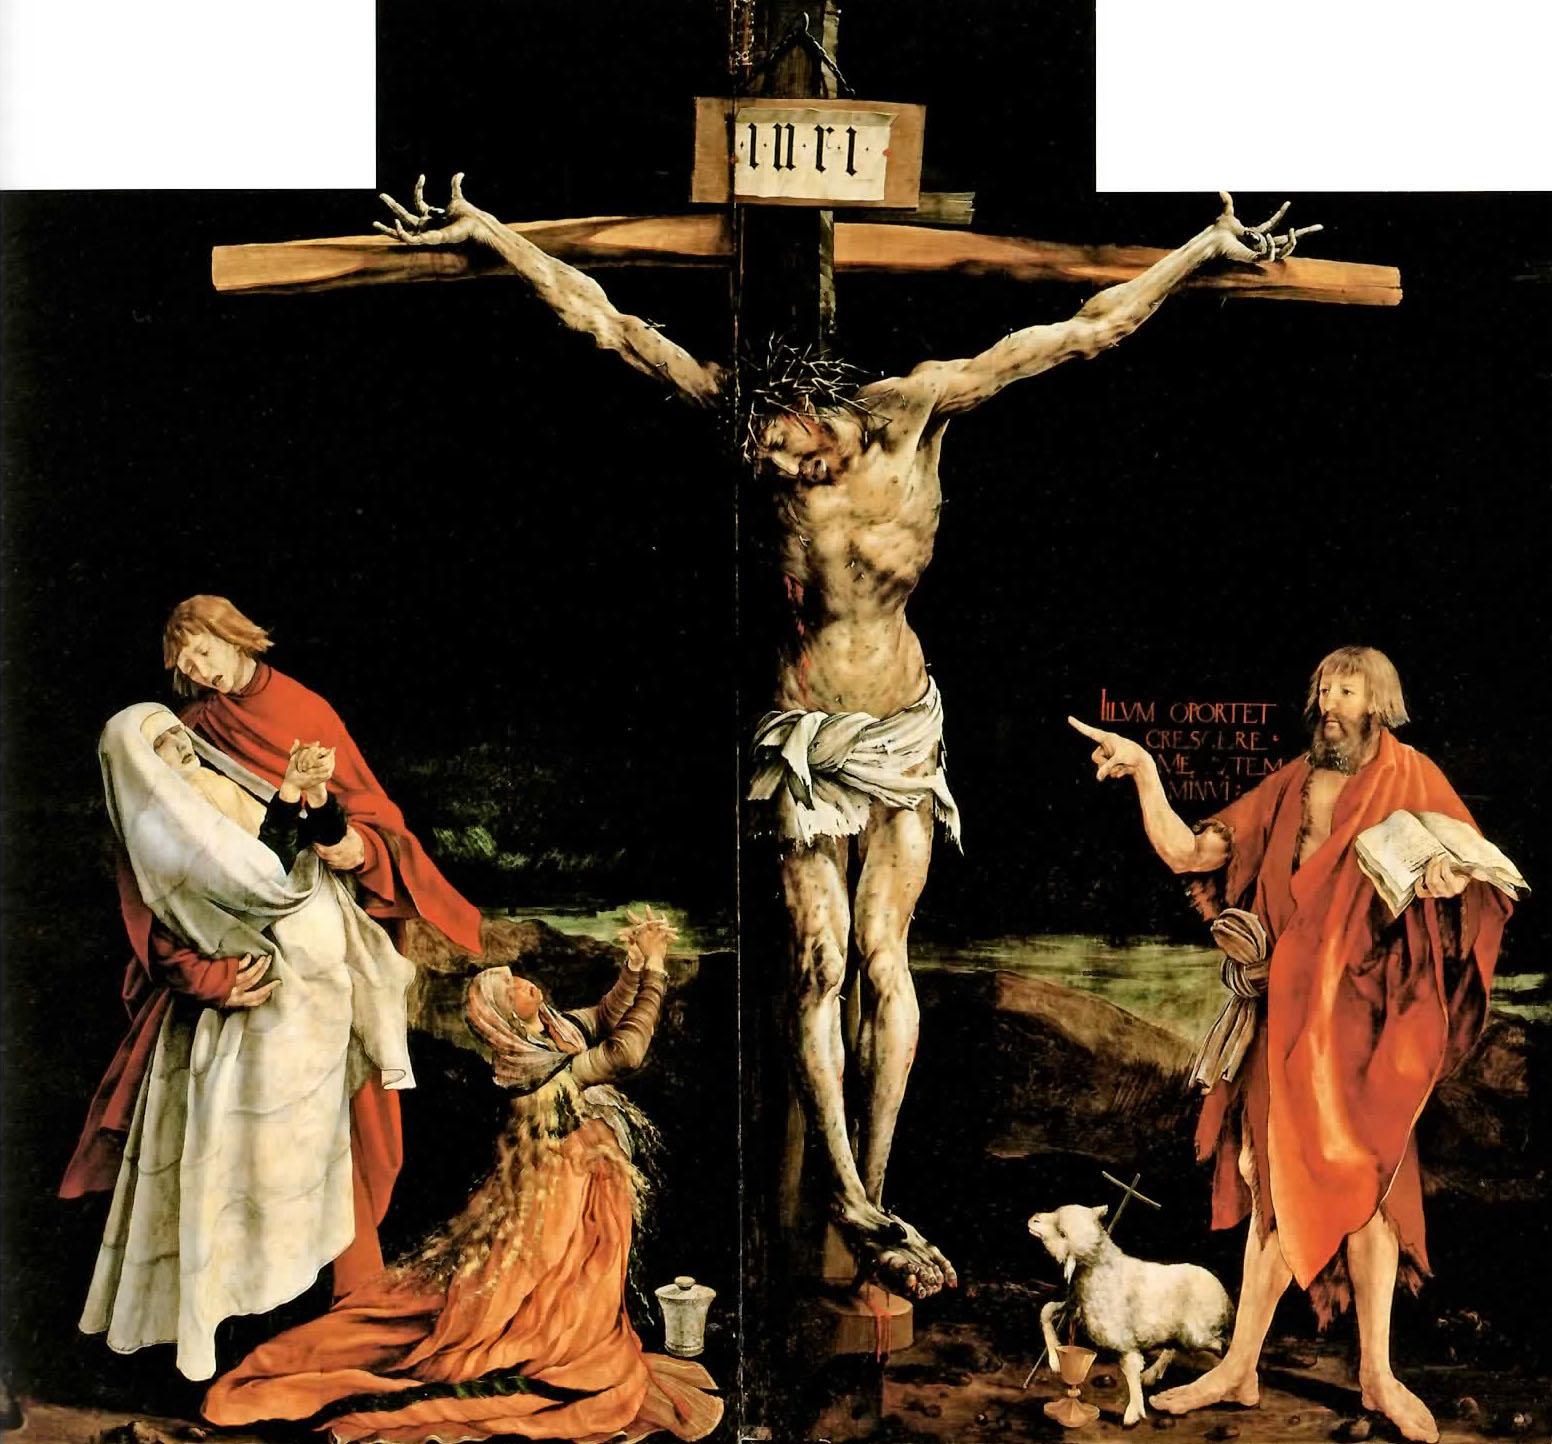 Mathis Grunewald - Crocifissione di Isenheim